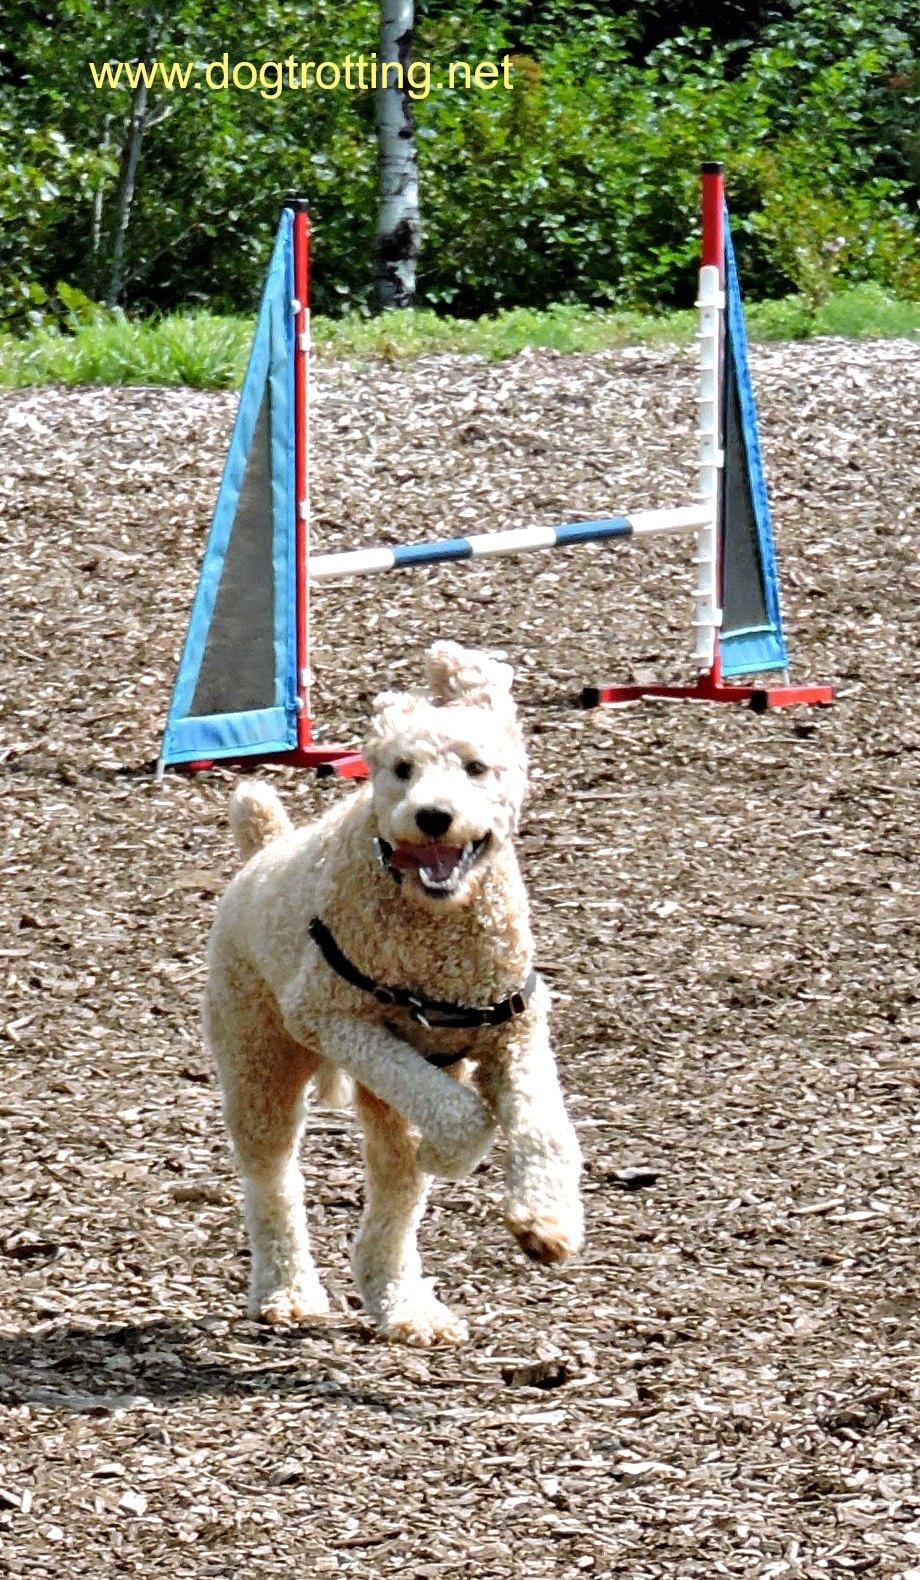 agility dog at Stouffville's Mutt Masquerade 2017 dogtrotting.net